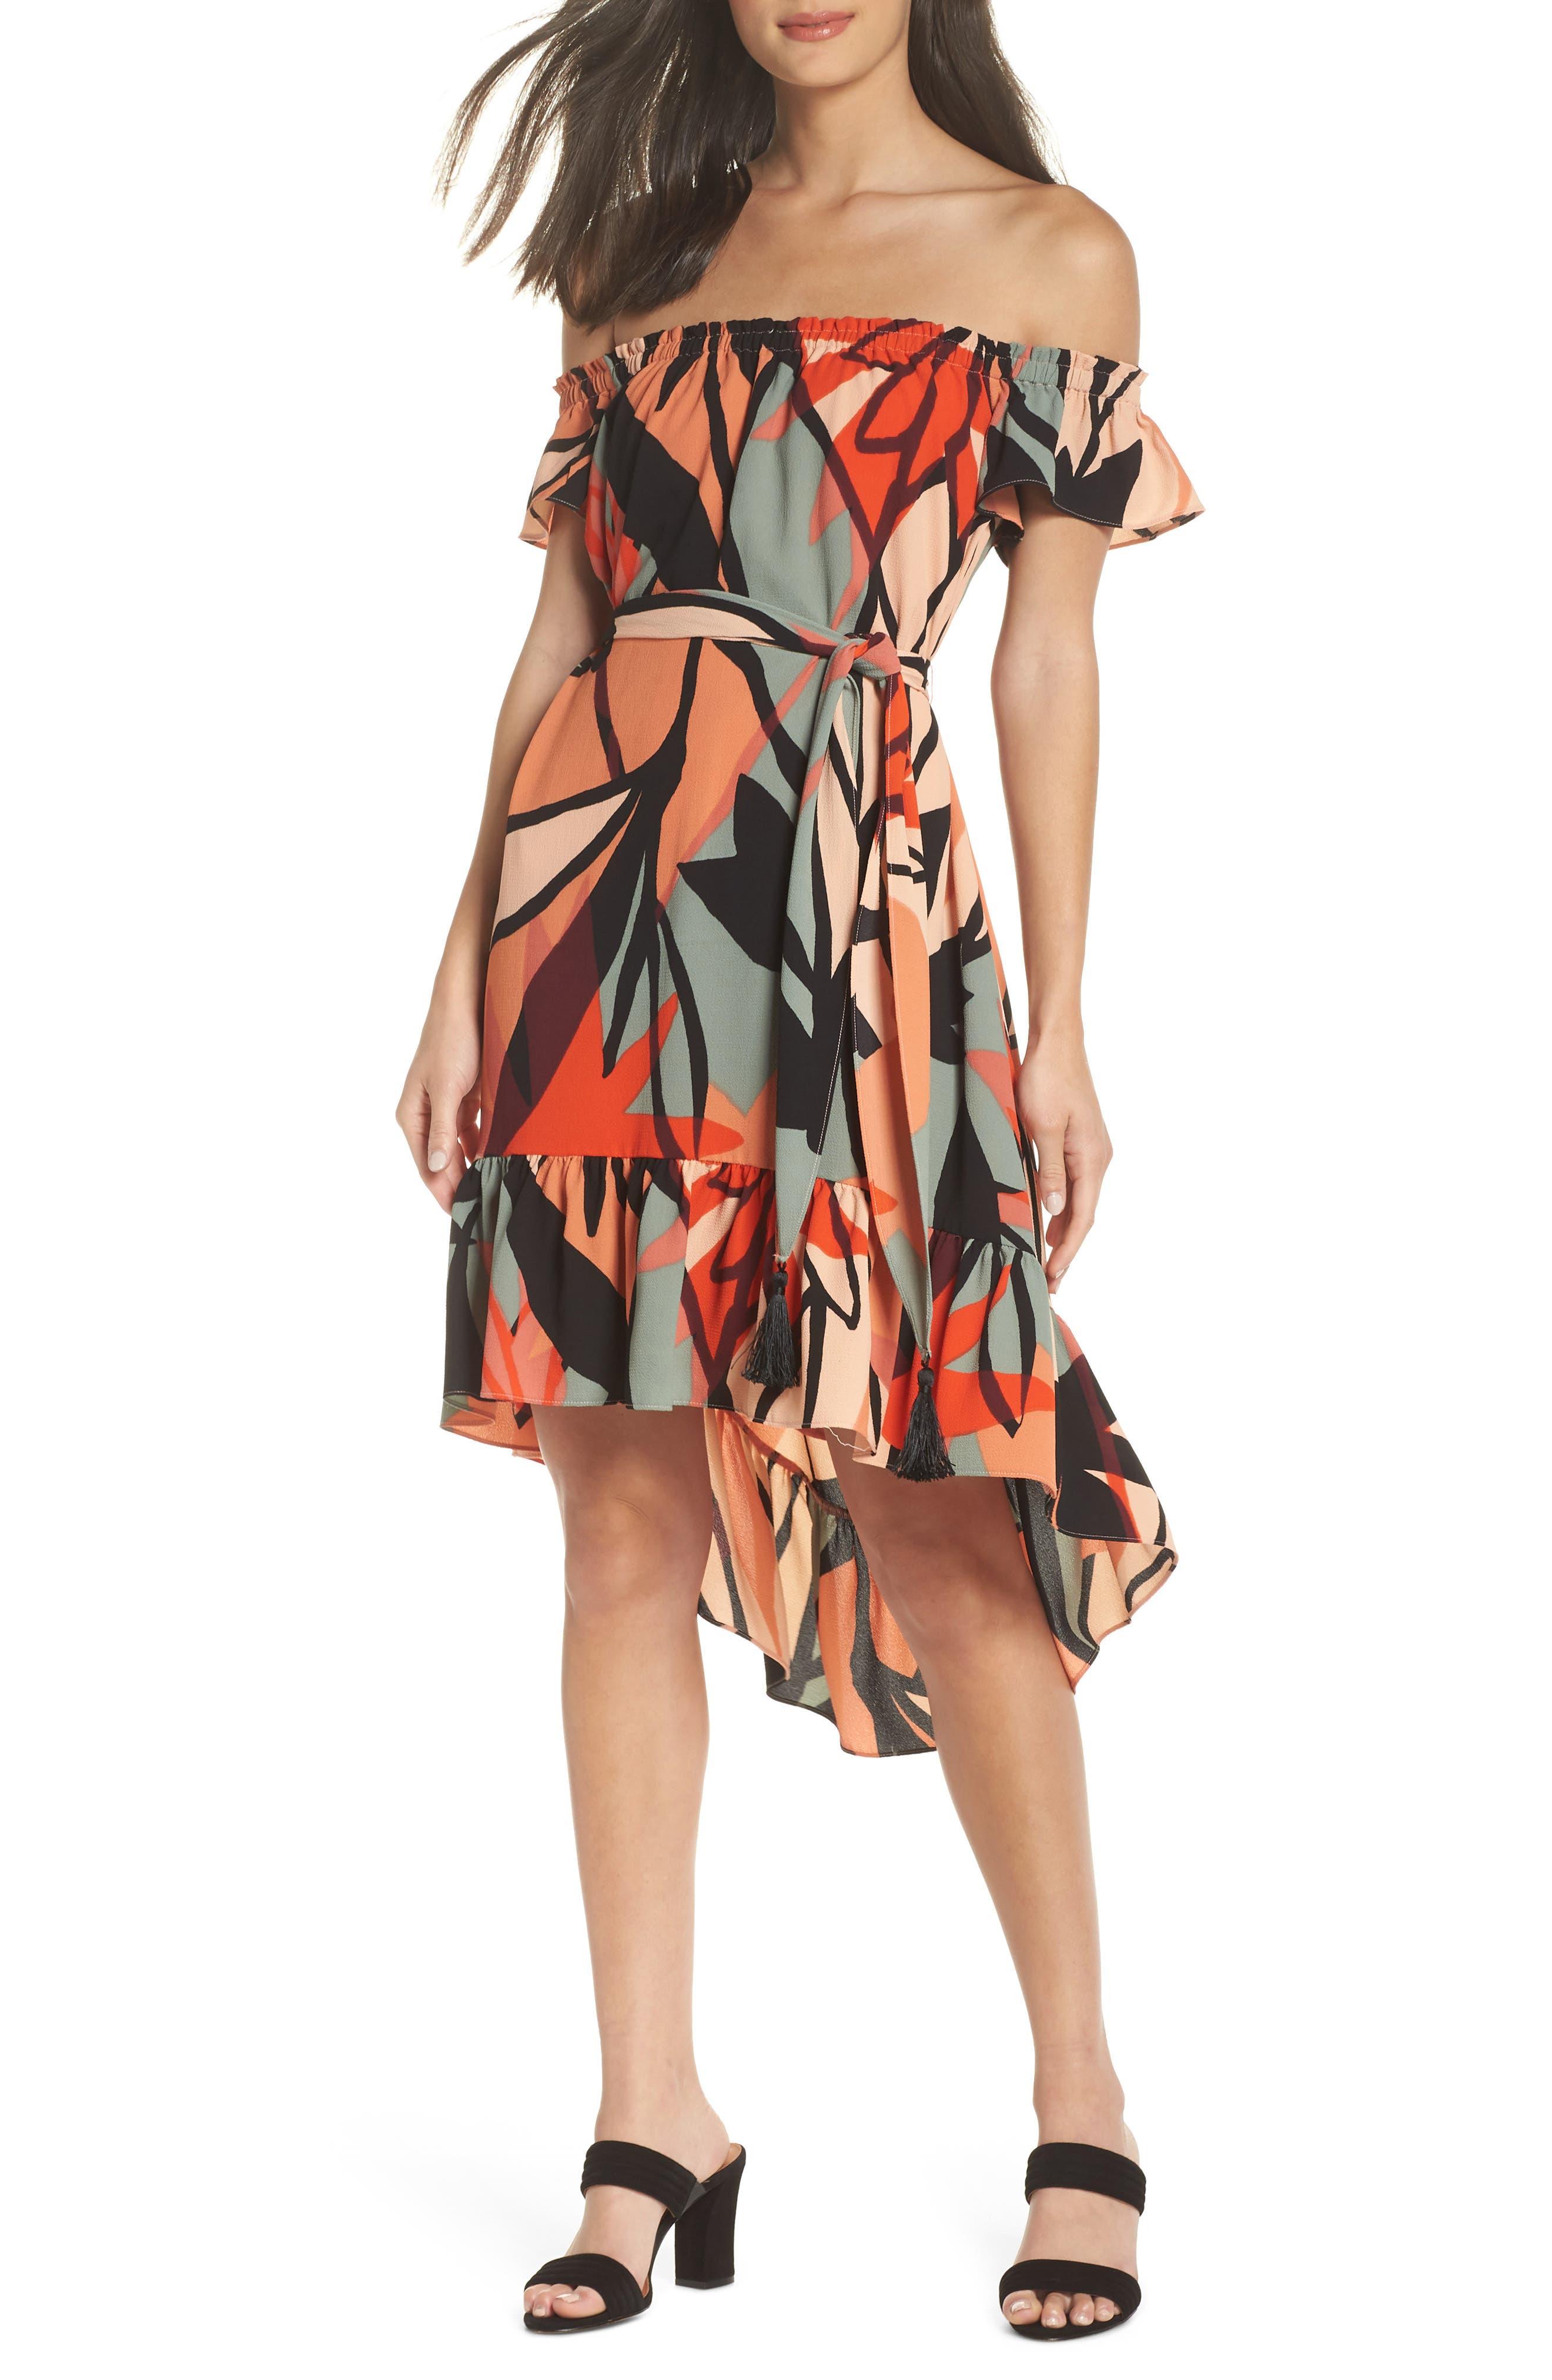 CLOVER AND SLOANE,                             Off the Shoulder Bubble Crepe Dress,                             Main thumbnail 1, color,                             800